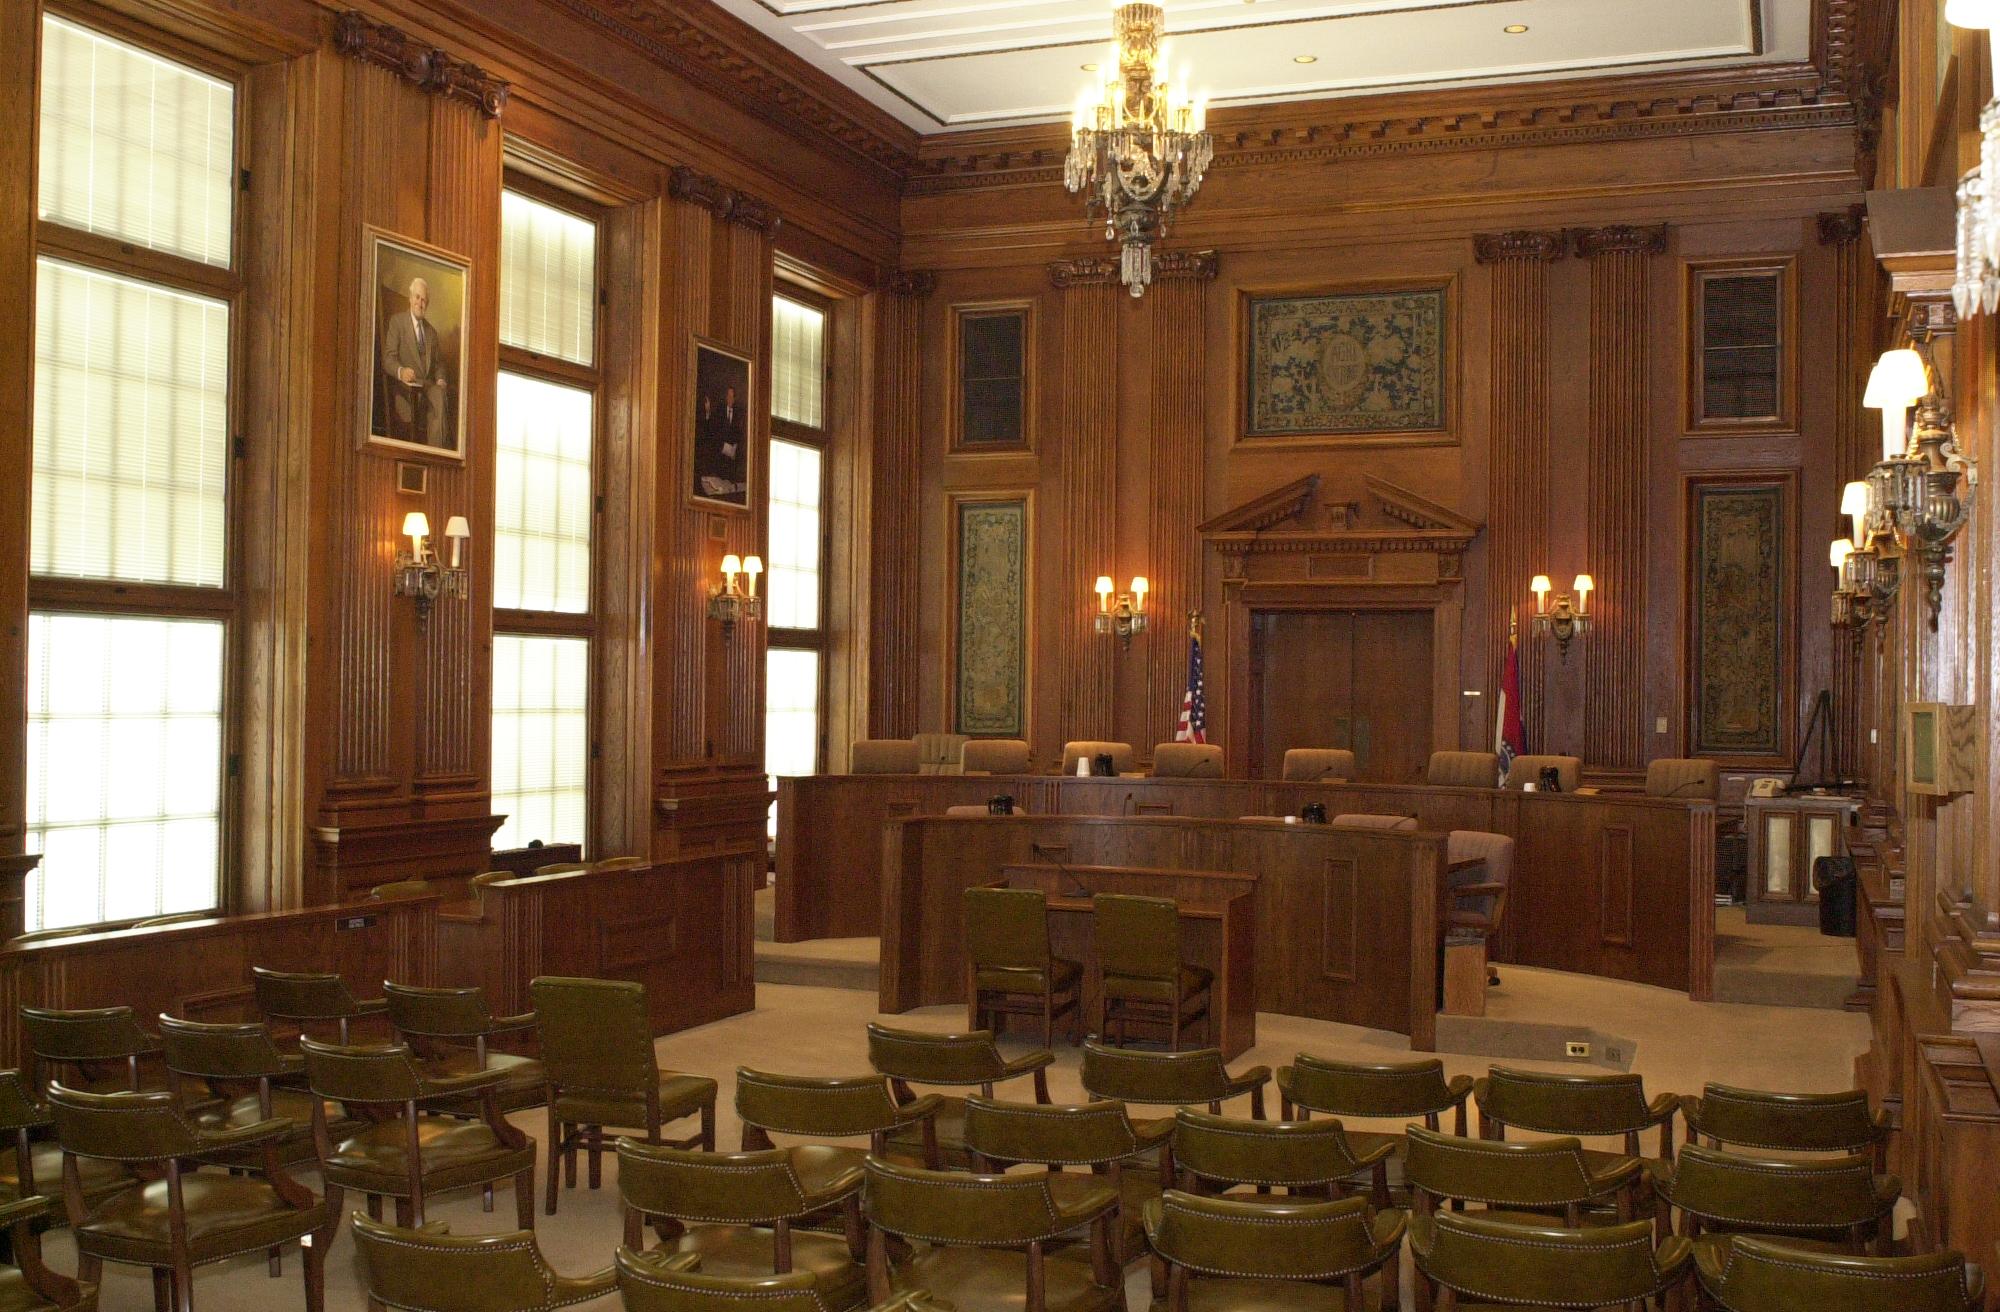 Missouri Senate sued over filming of hearings  Missourinet